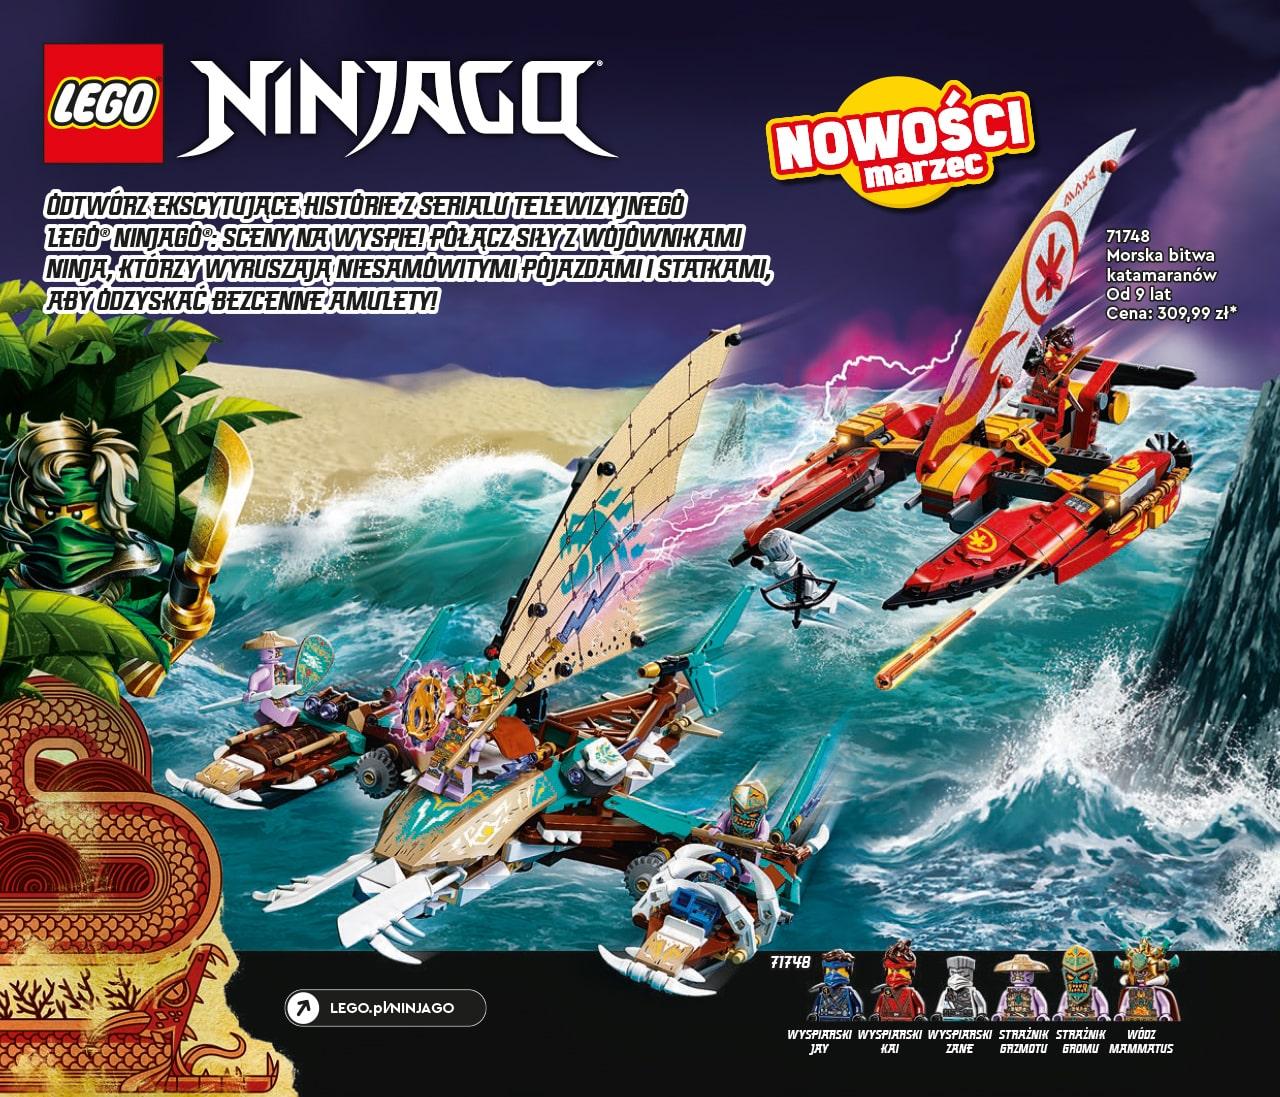 Katalog LEGO styczeń-maj 2021 - wersja polska - 90 - LEGO NINJAGO